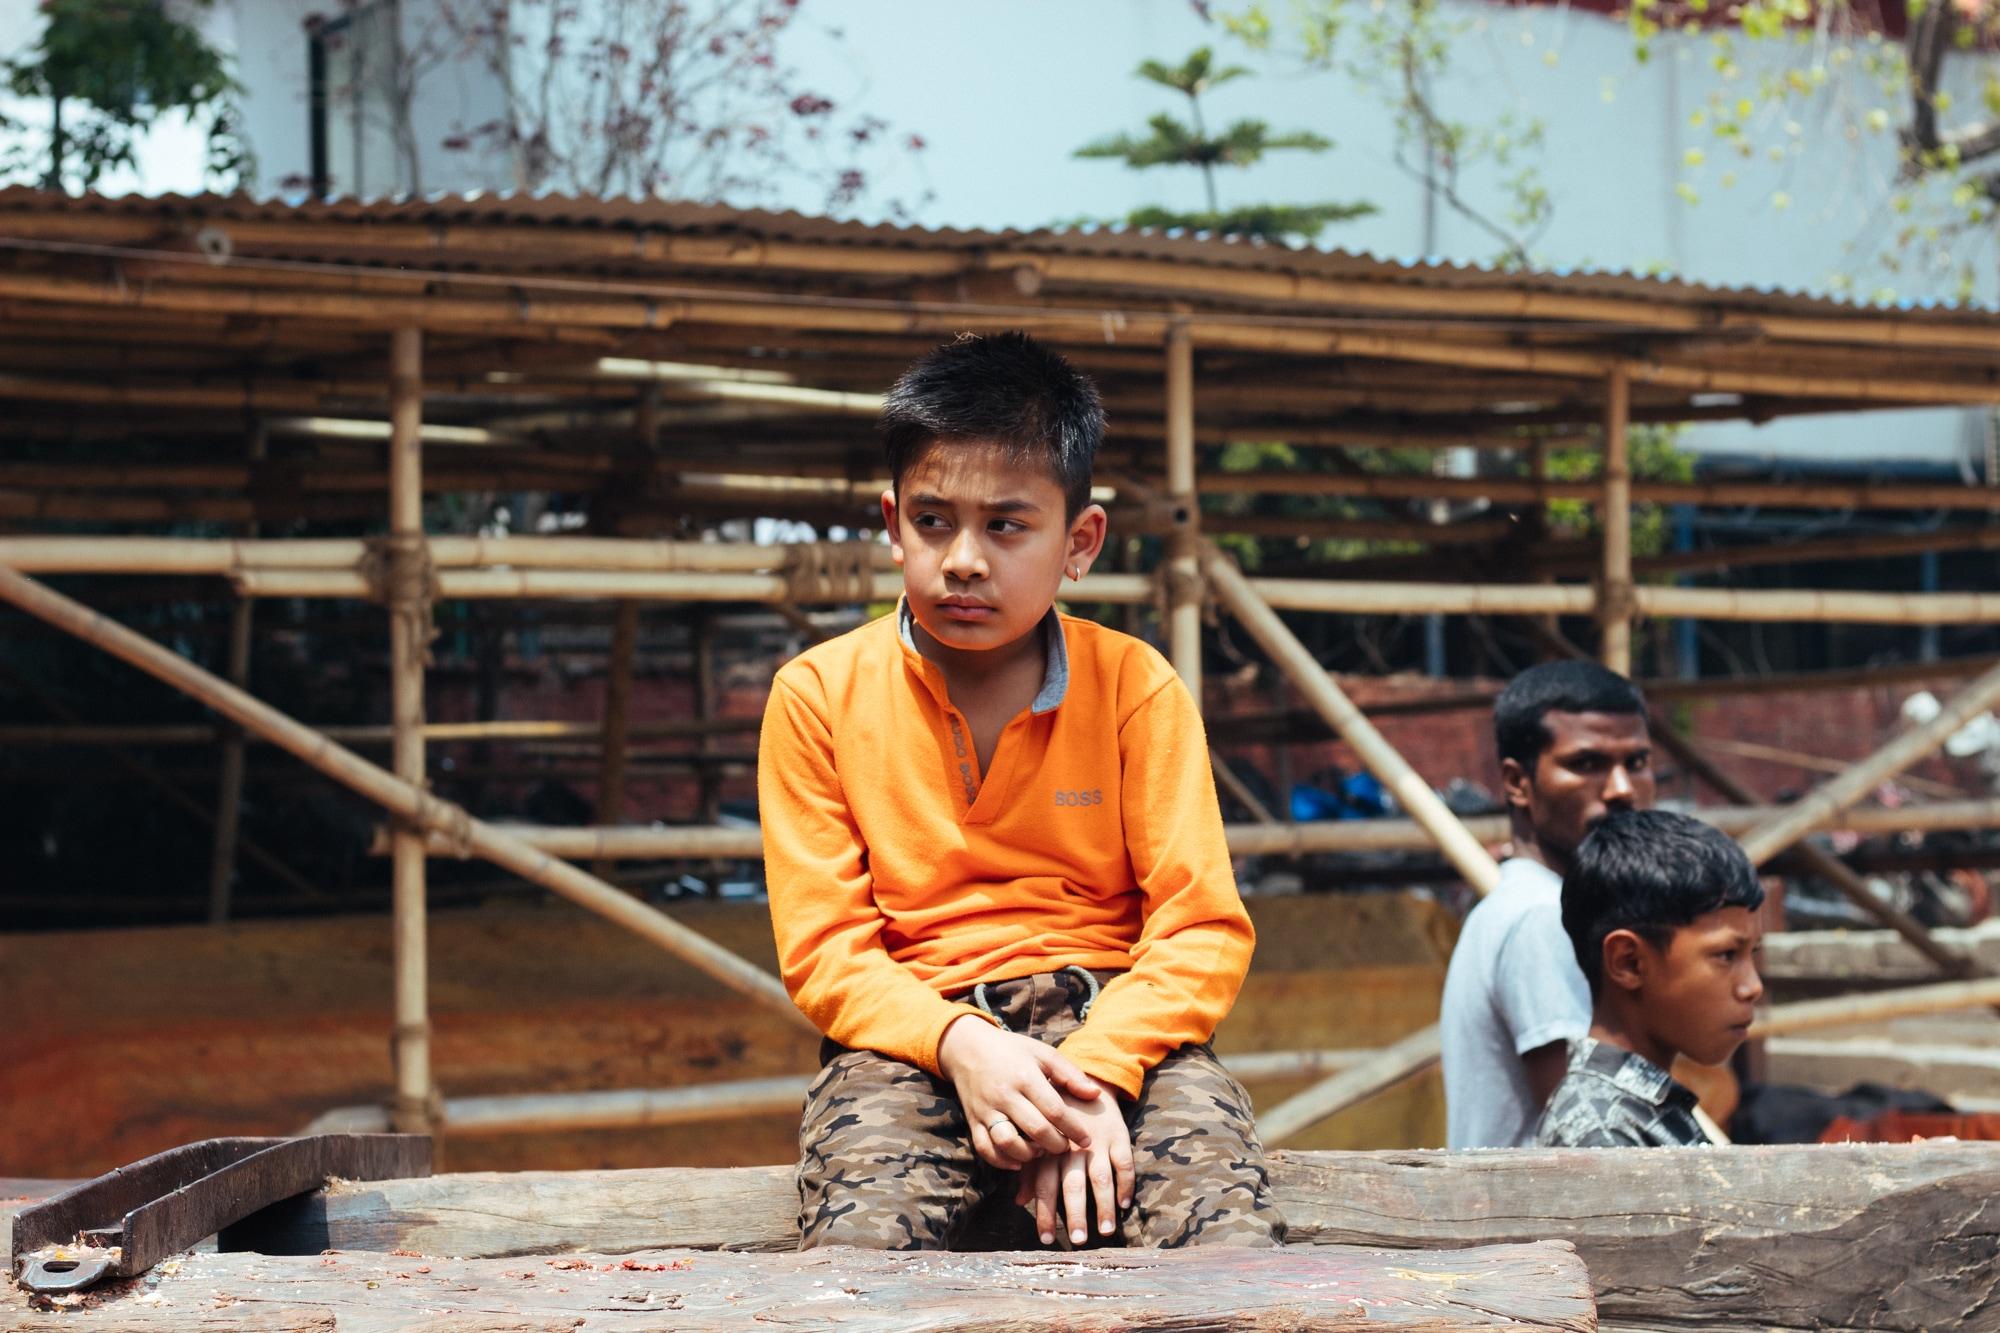 A boy sitting on a chariot